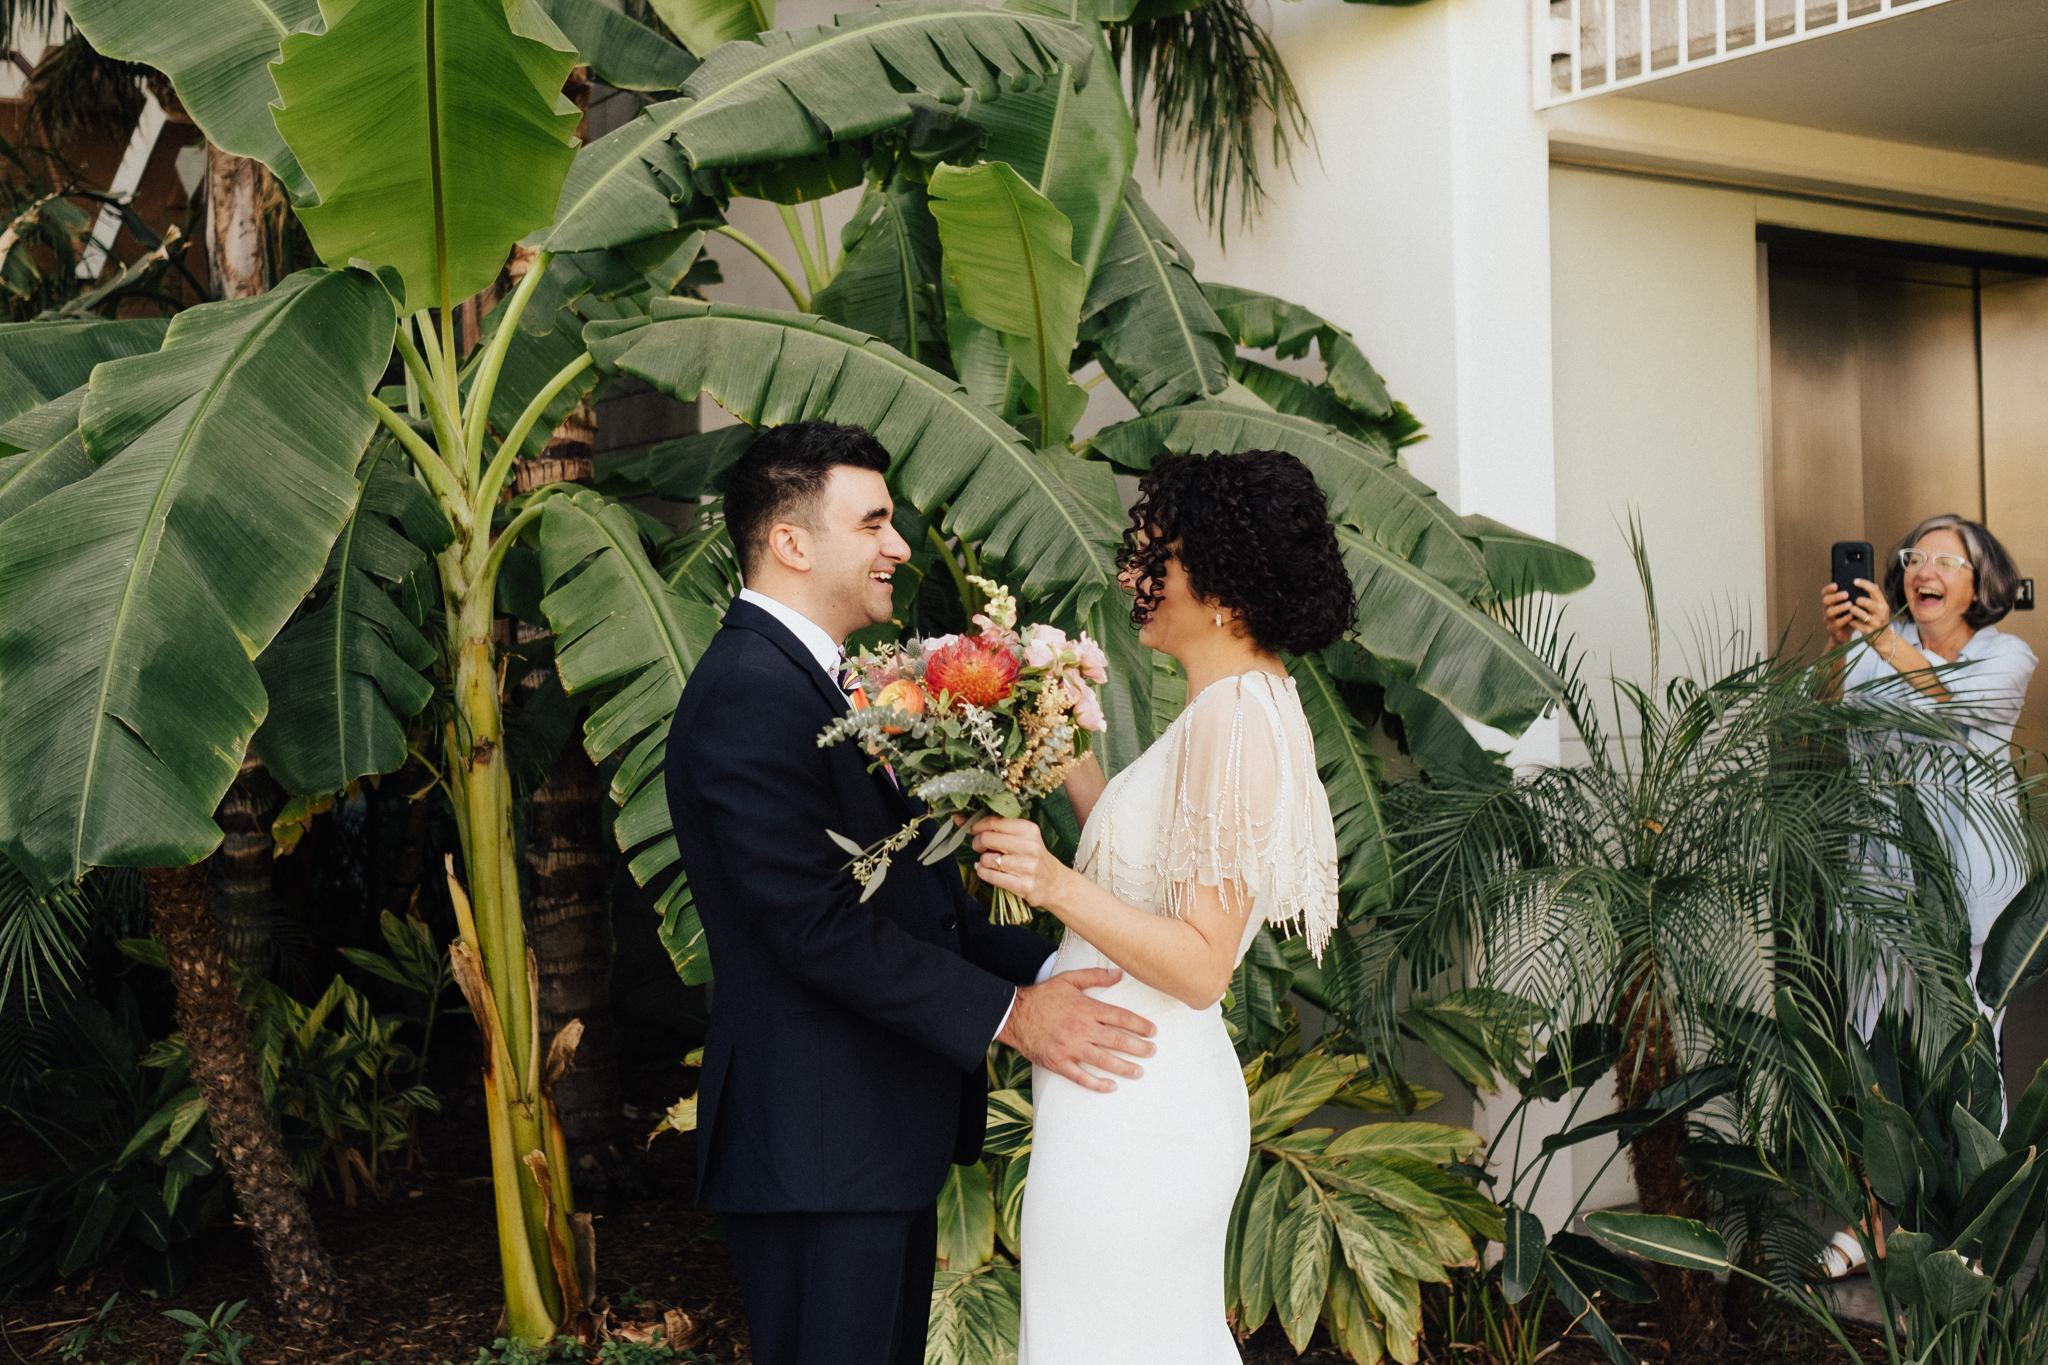 Arizona-Adventure-Elopement-Wedding-Photographer-3.jpg